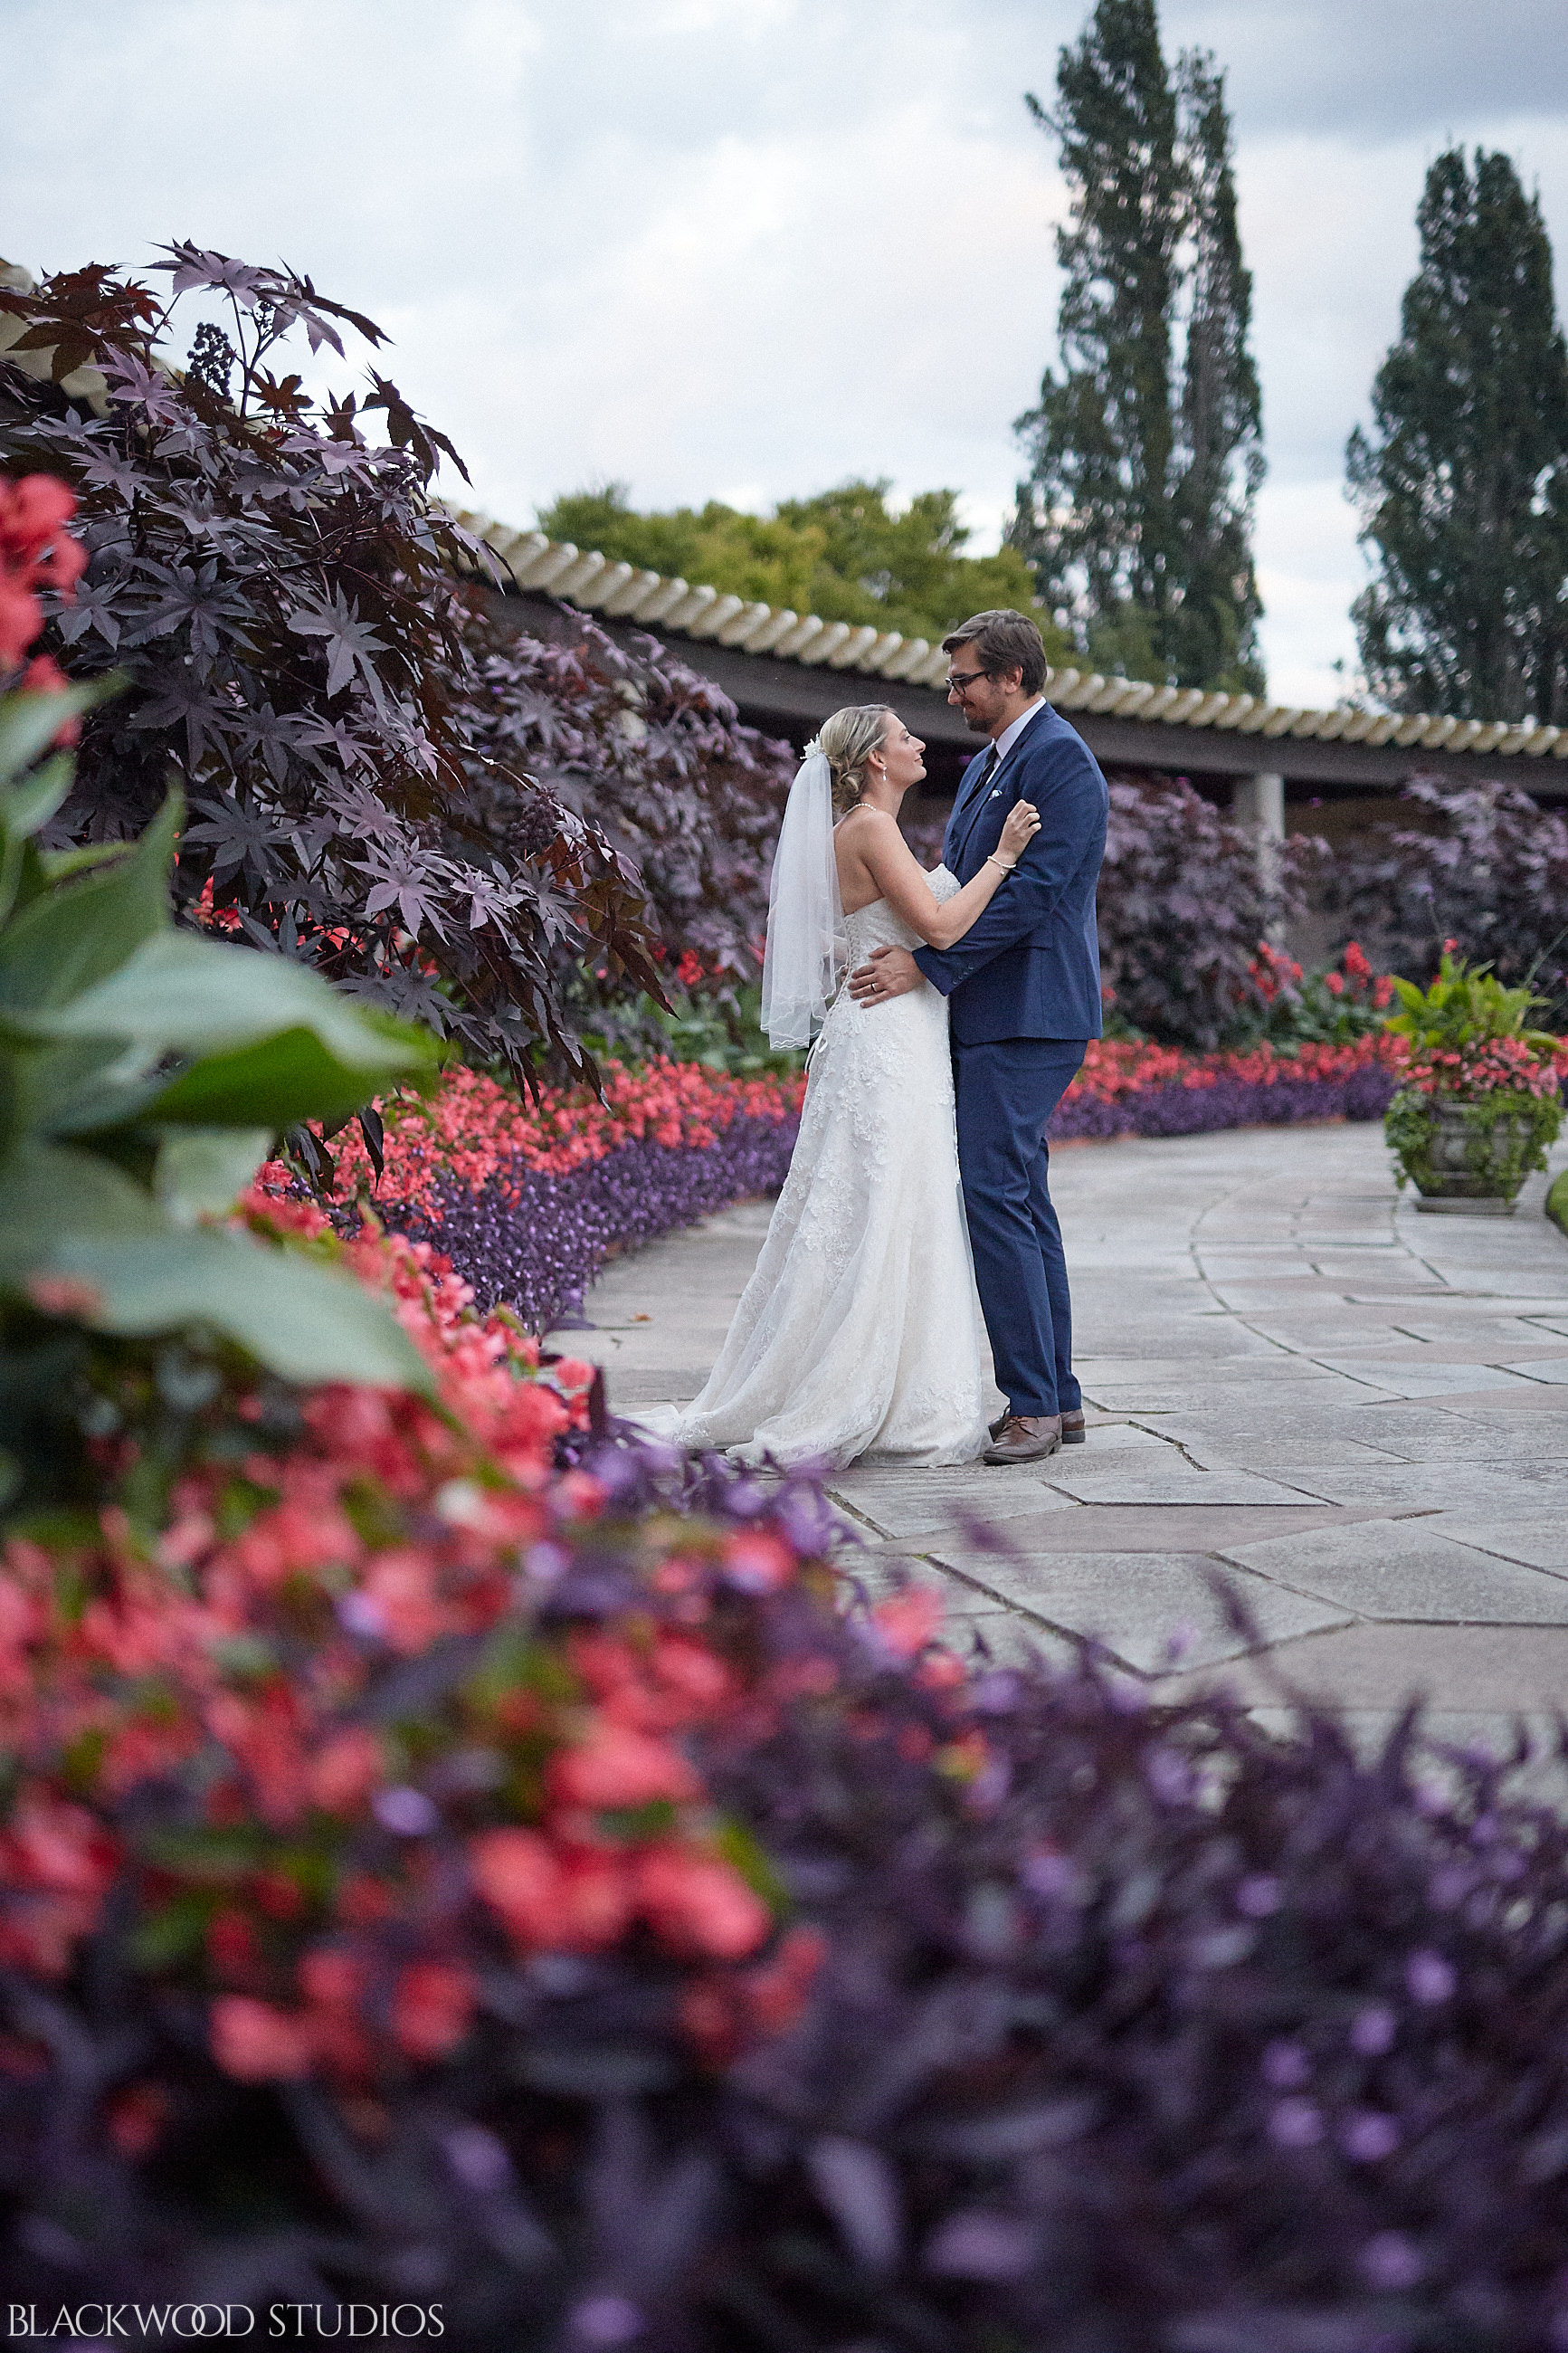 Blackwood-Studios-Wedding-Photography-20170928-185237-Marek-Katie-Michalek-Oakes-Garden-Theatre-Niagara-Falls-Ontario-Canada.jpg